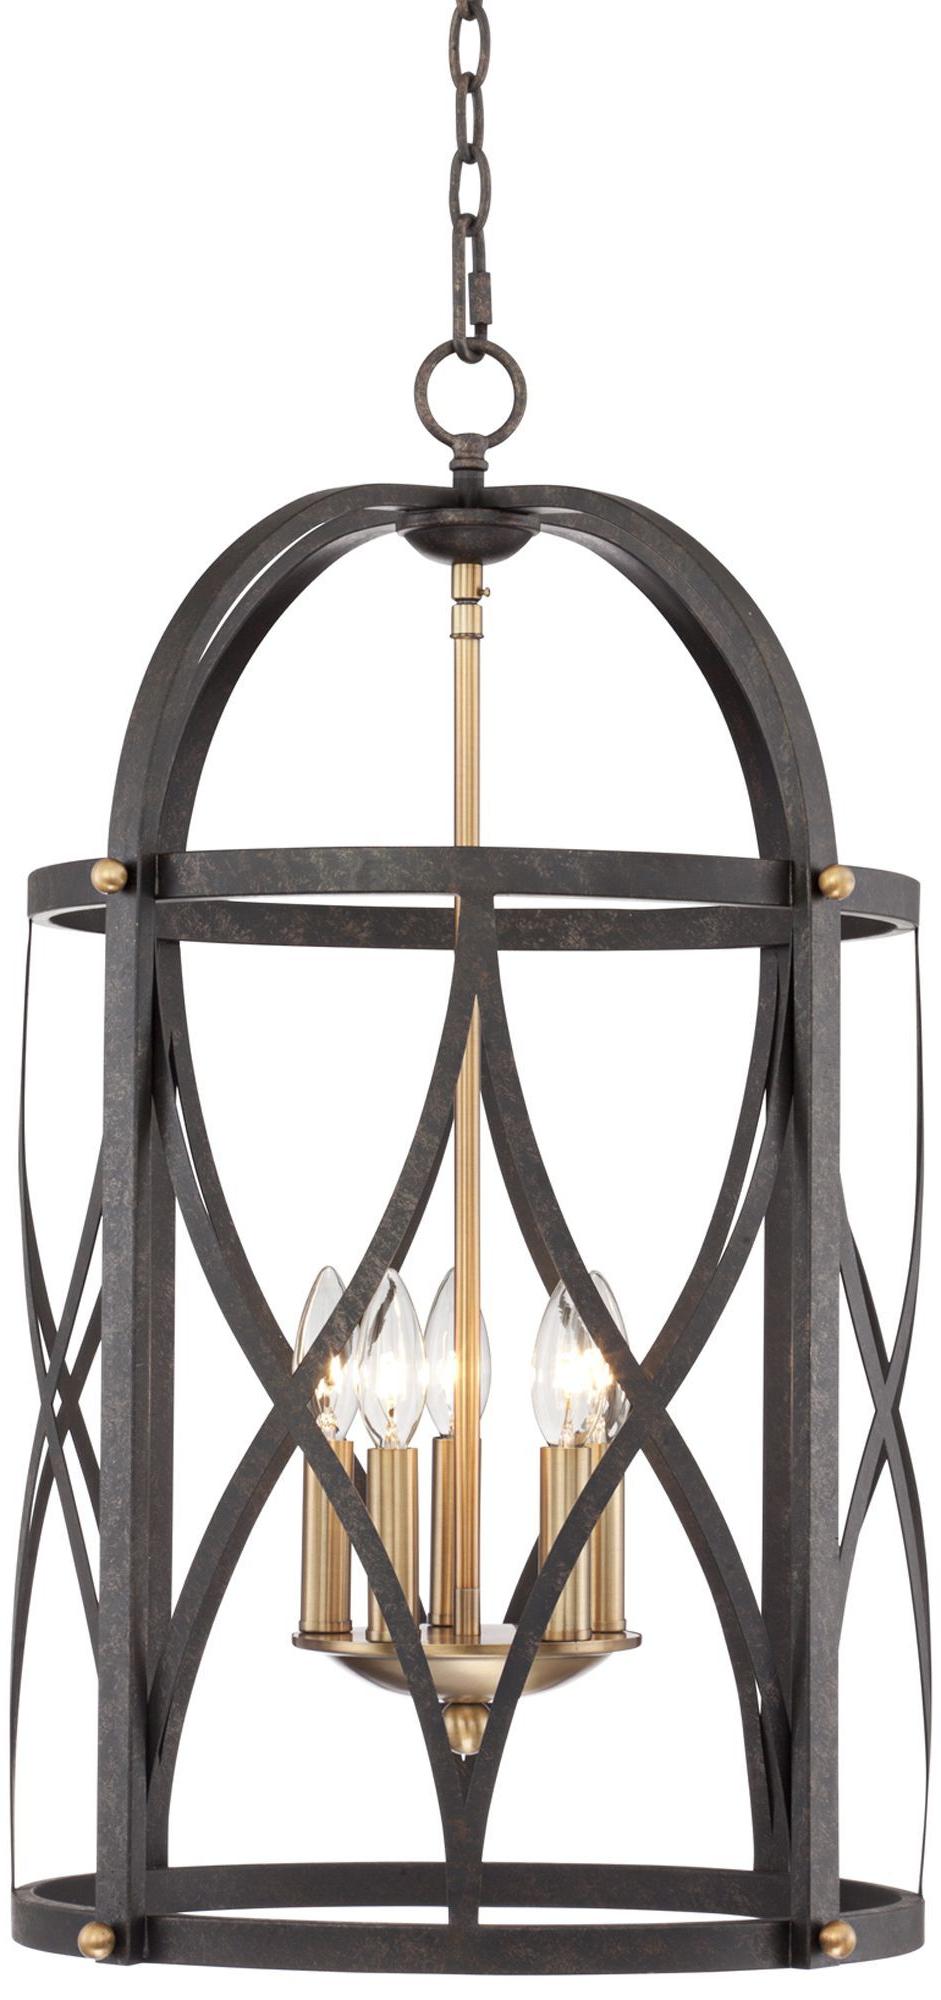 Torrison 5 Light 16' Wide Dark Bronze Foyer Chandelier For Favorite Nisbet 4 Light Lantern Geometric Pendants (View 24 of 25)